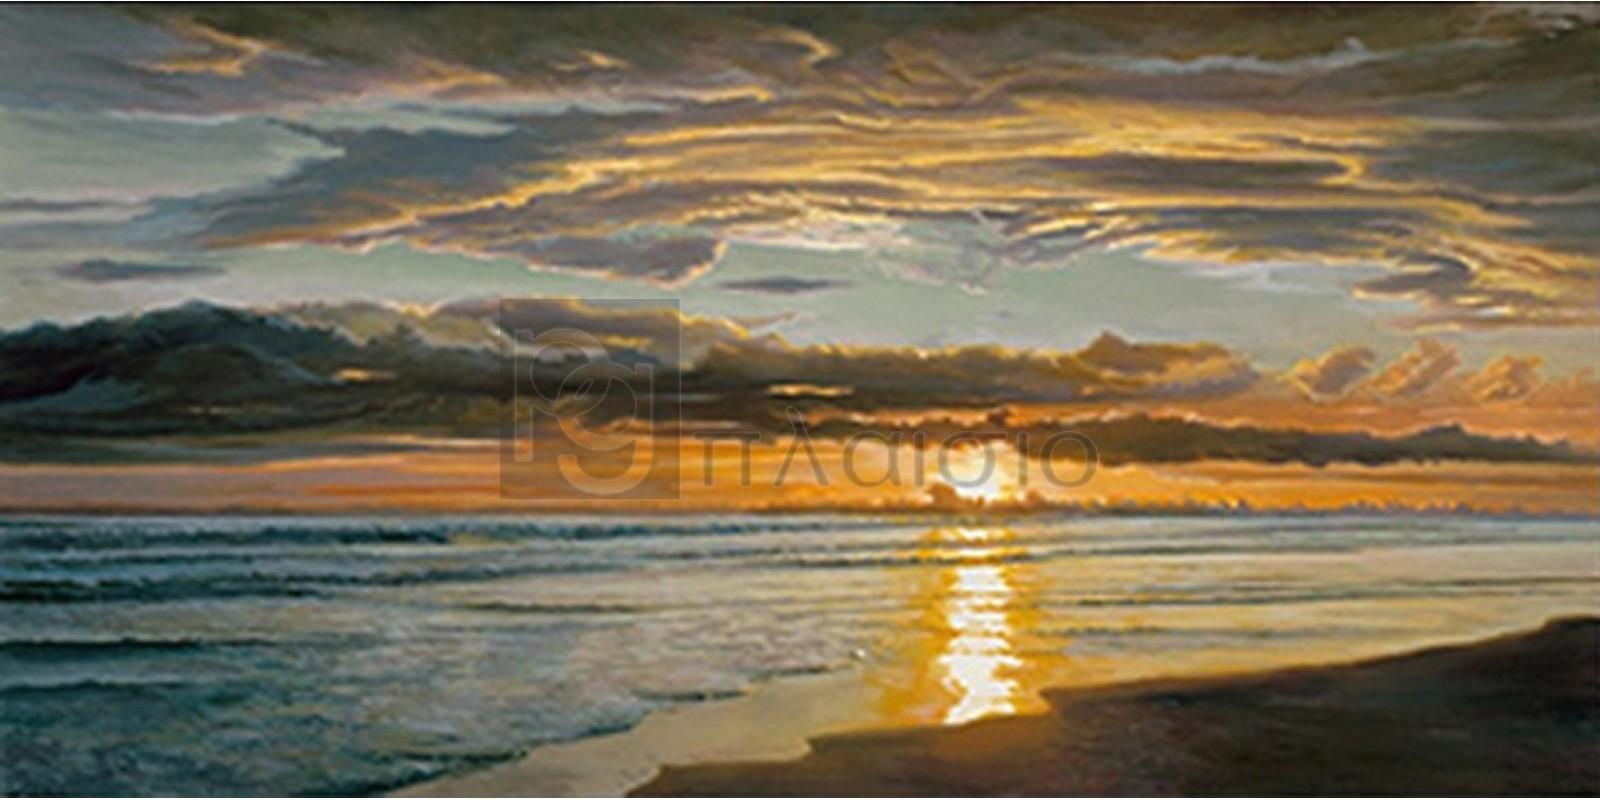 Dan Werner - Shoreline Splendor